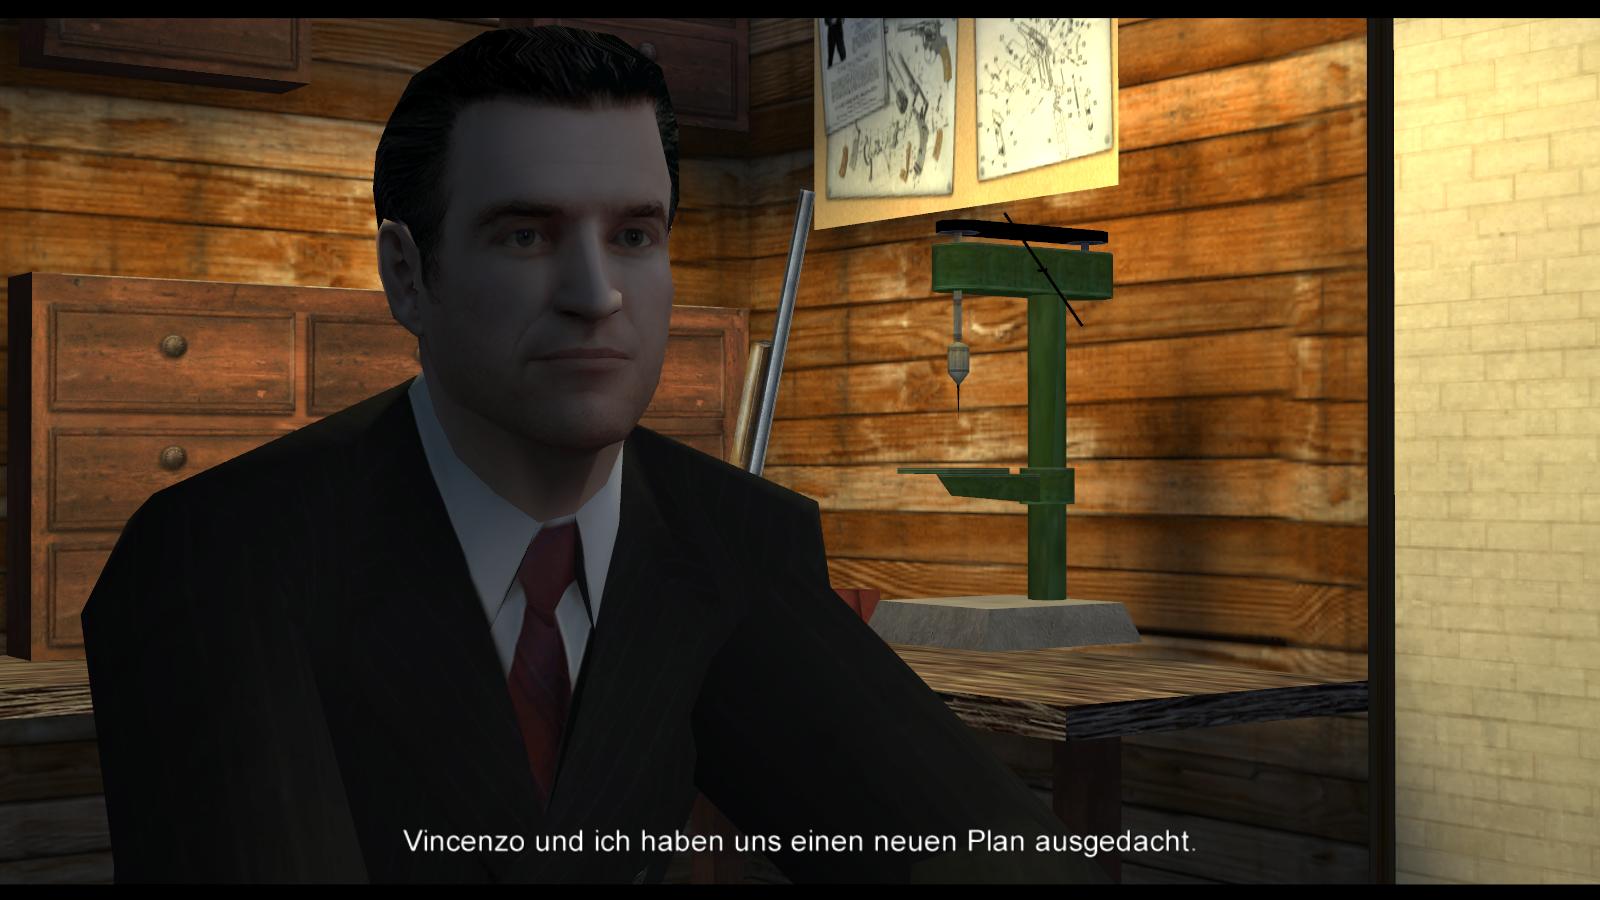 [Image: game2012-08-1415-27-0i5sxt.png]